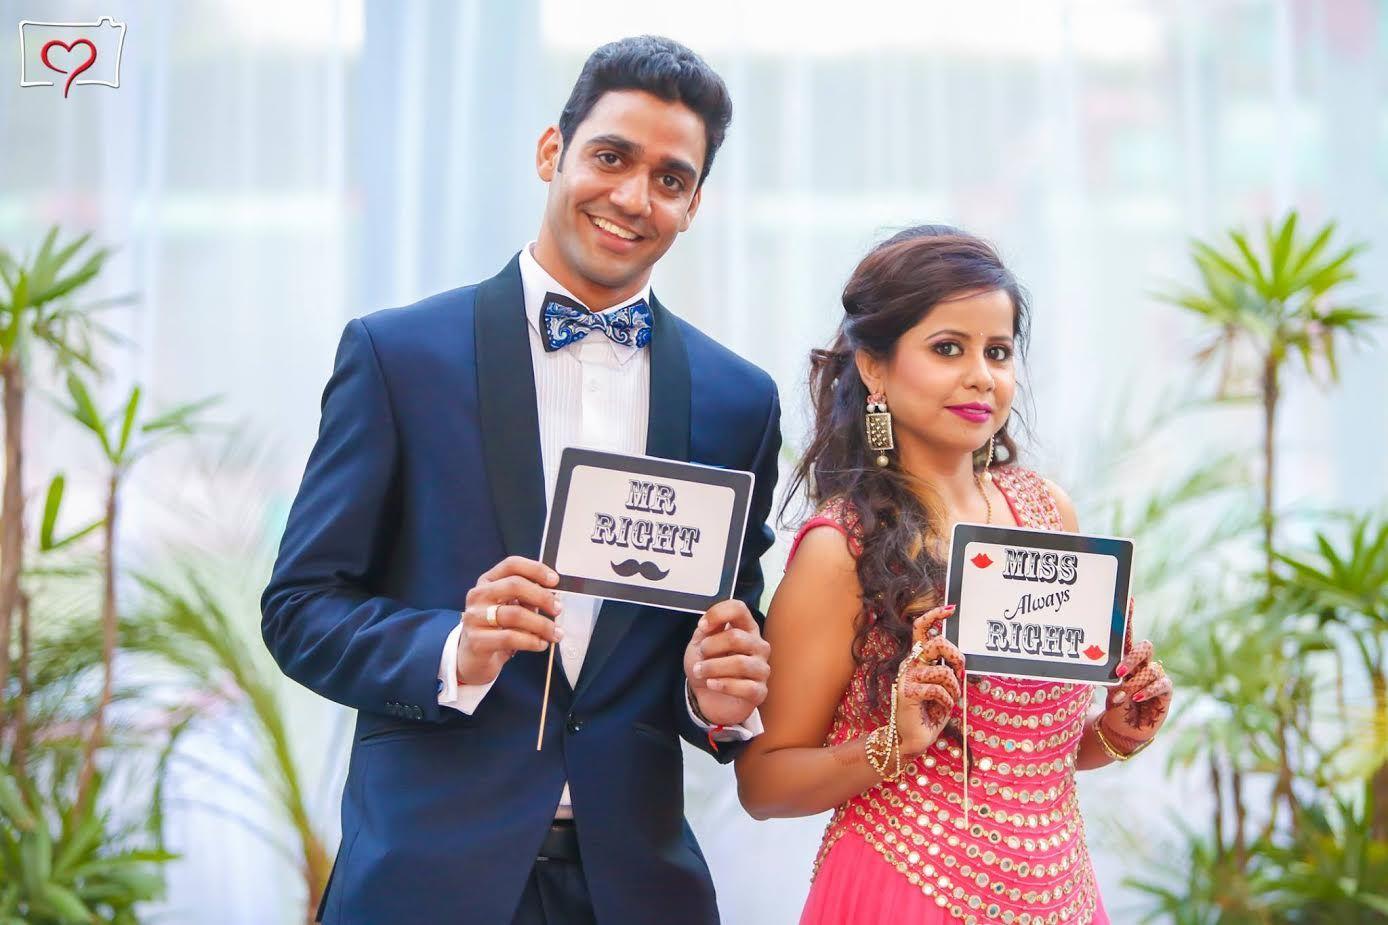 Wait is over! Da' Momento Studio, Delhi  #weddingnet #wedding #india #delhiwedding #indian #indianwedding #weddingphotographer #candidphotographer #weddingdresses #mehendi #ceremony #realwedding #lehenga #lehengacholi #choli #lehengawedding #lehengasaree #saree #bridalsaree #weddingsaree #indianweddingoutfits #outfits #backdrops  #bridesmaids #prewedding #photoshoot #photoset #details #sweet #cute #gorgeous #fabulous #jewels #rings #tikka #earrings #sets #lehnga #love #inspiration